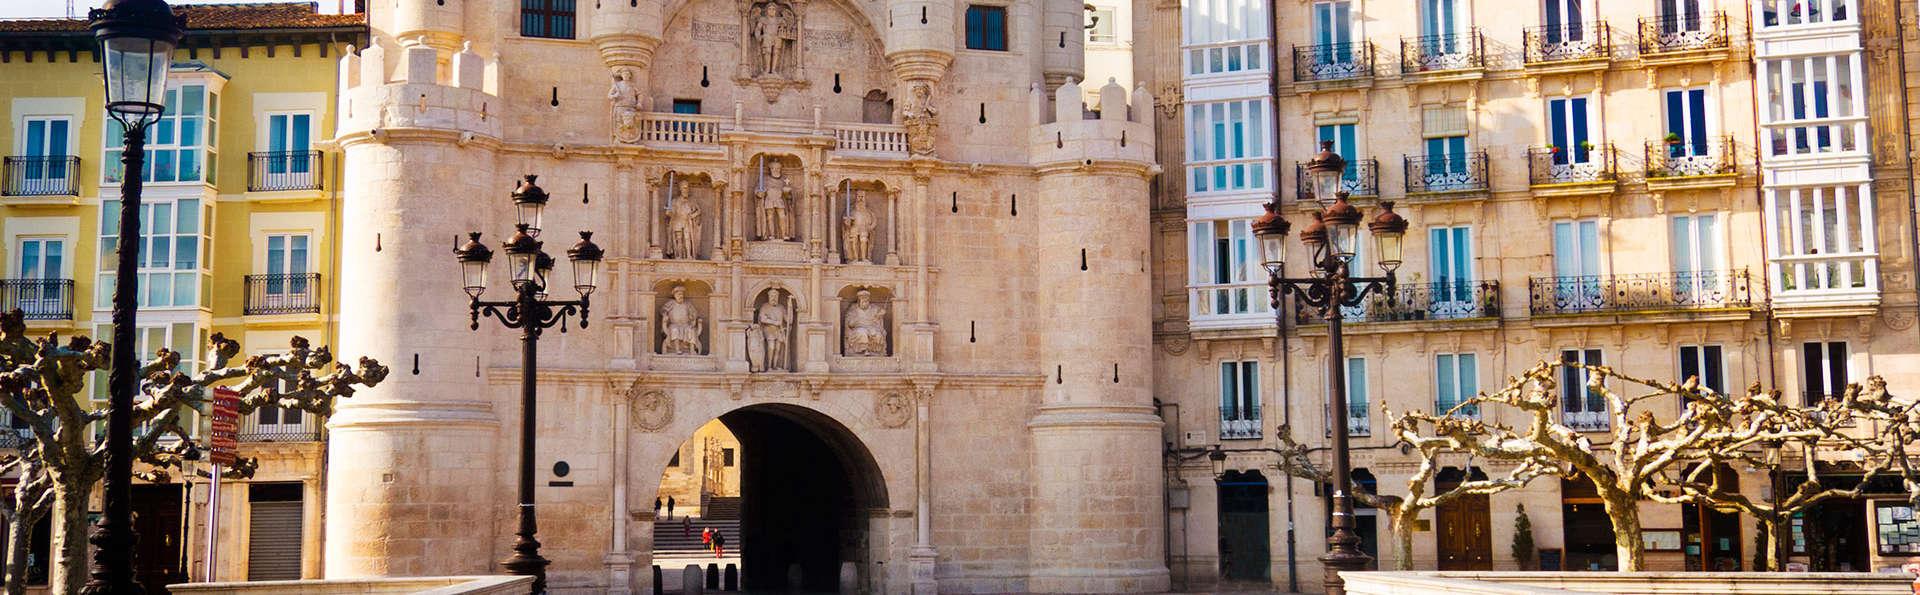 Hotel Maria Luisa - EDIT_destination1.jpg